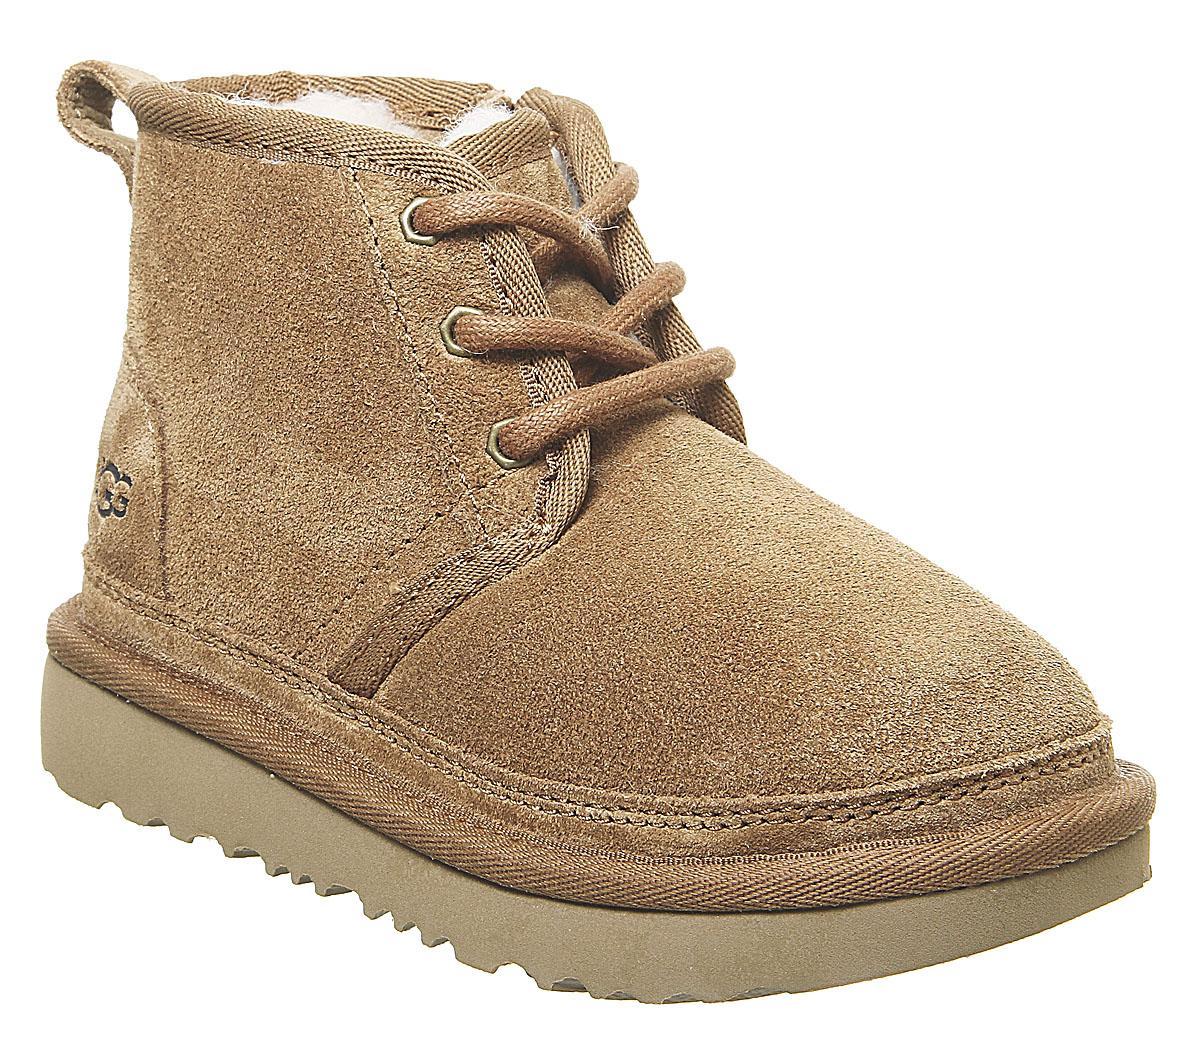 Neumel II Infant Boots